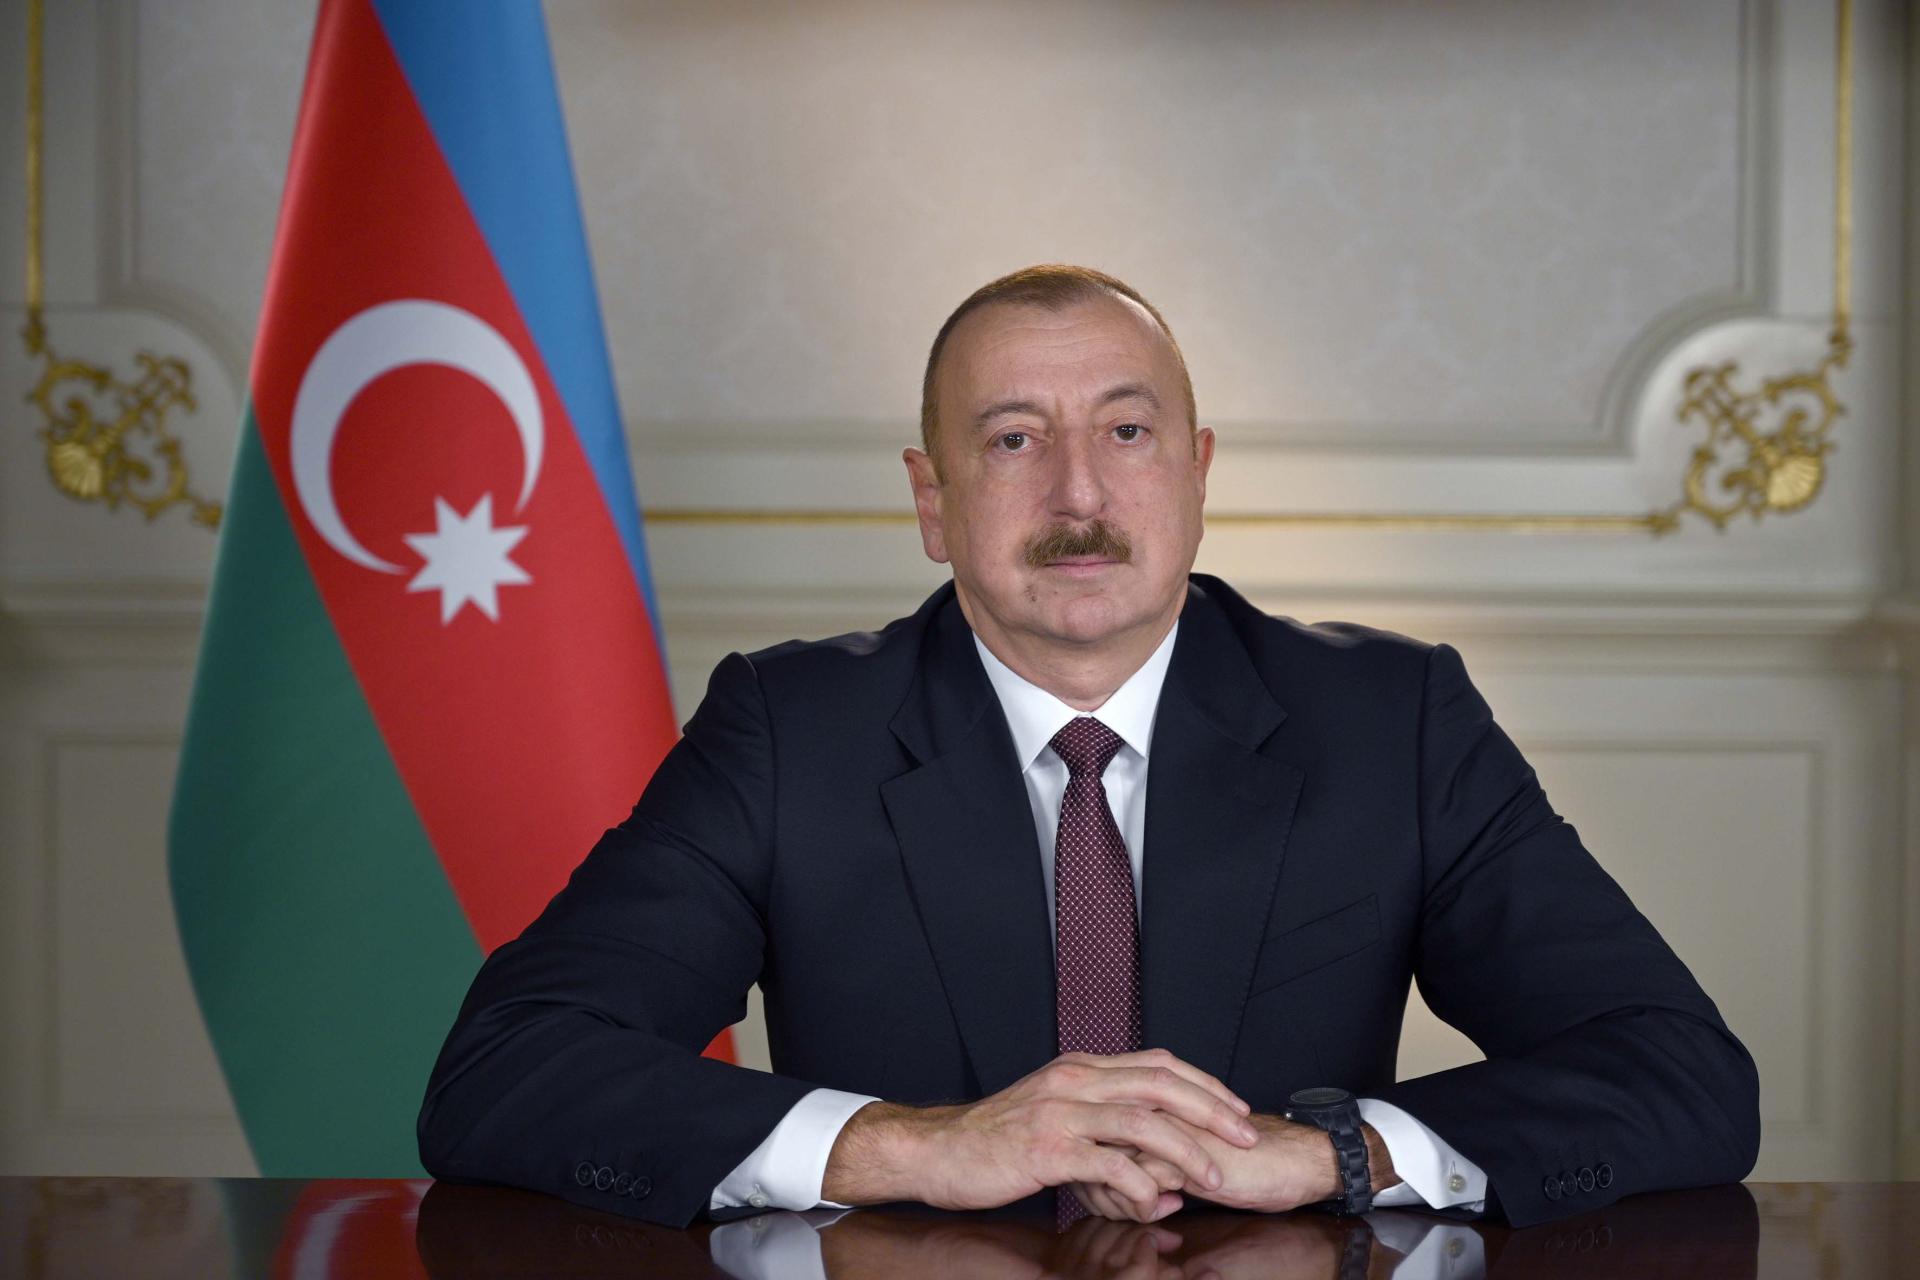 2020/09/ilham_aliyev_main_new_president_310120_1_1599308884.jpg